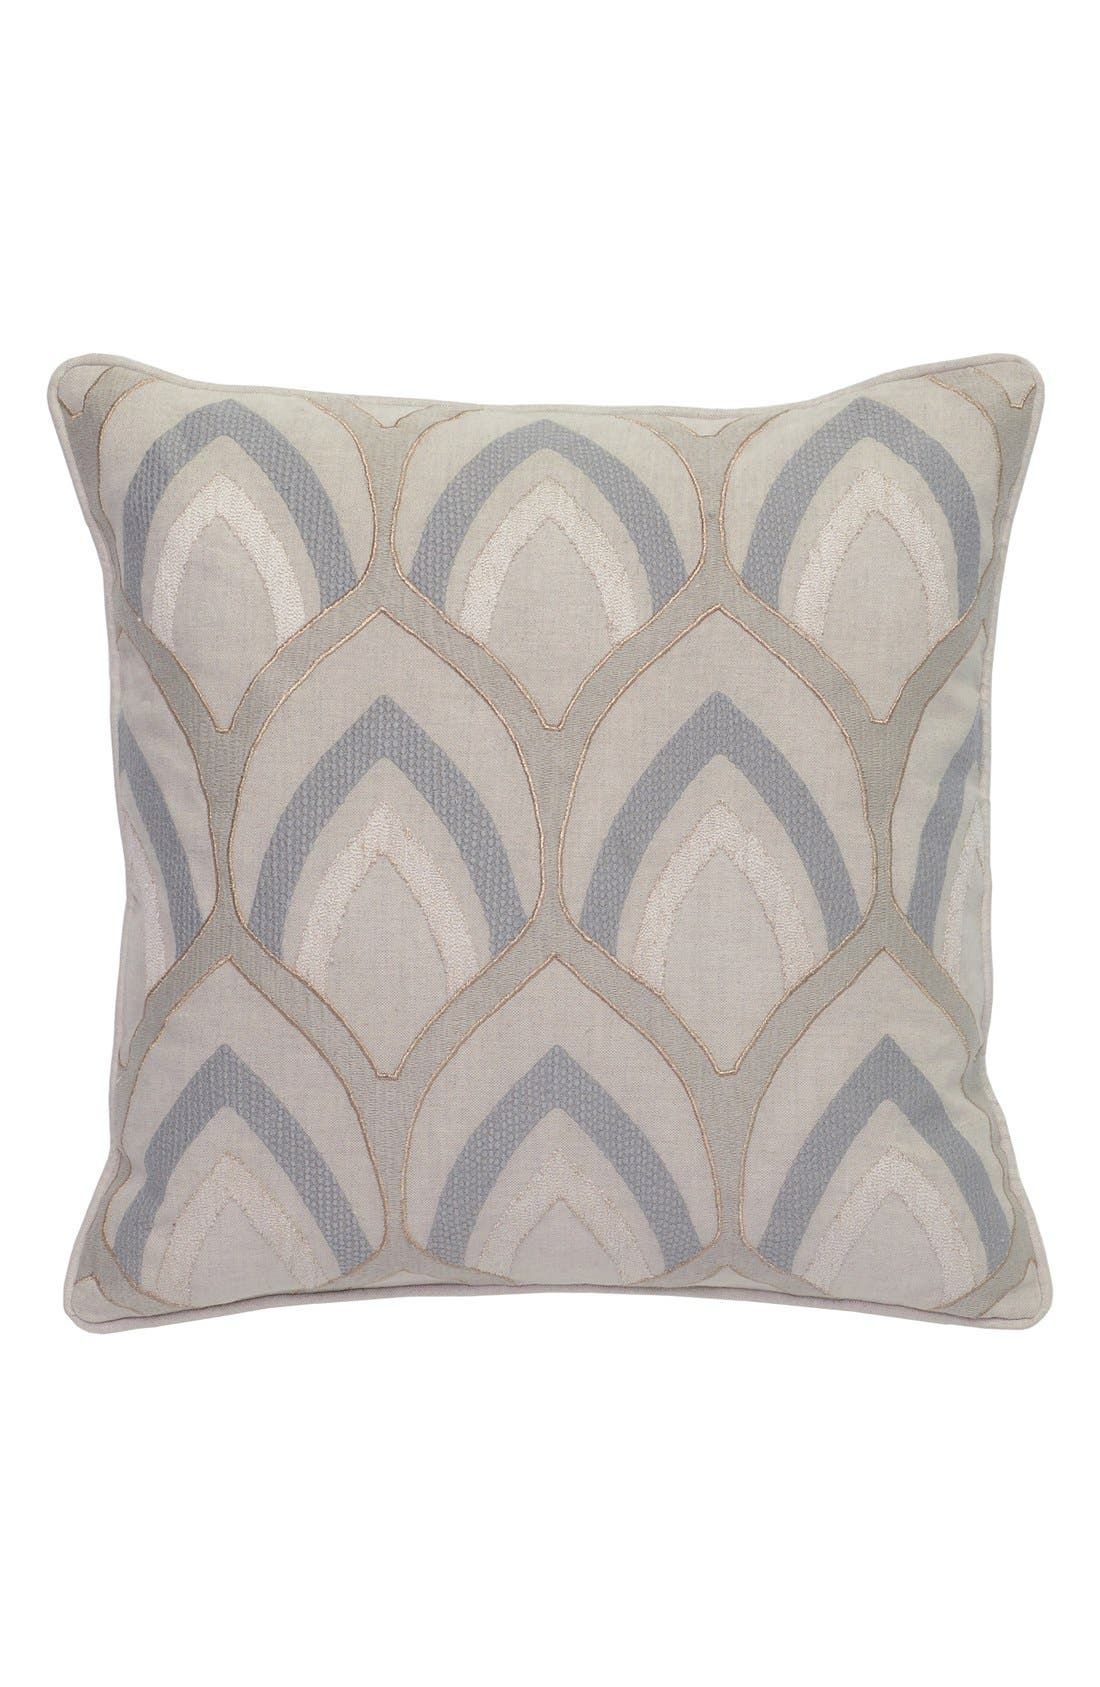 Main Image - Villa Home Collection 'Hollis' Decorative Pillow